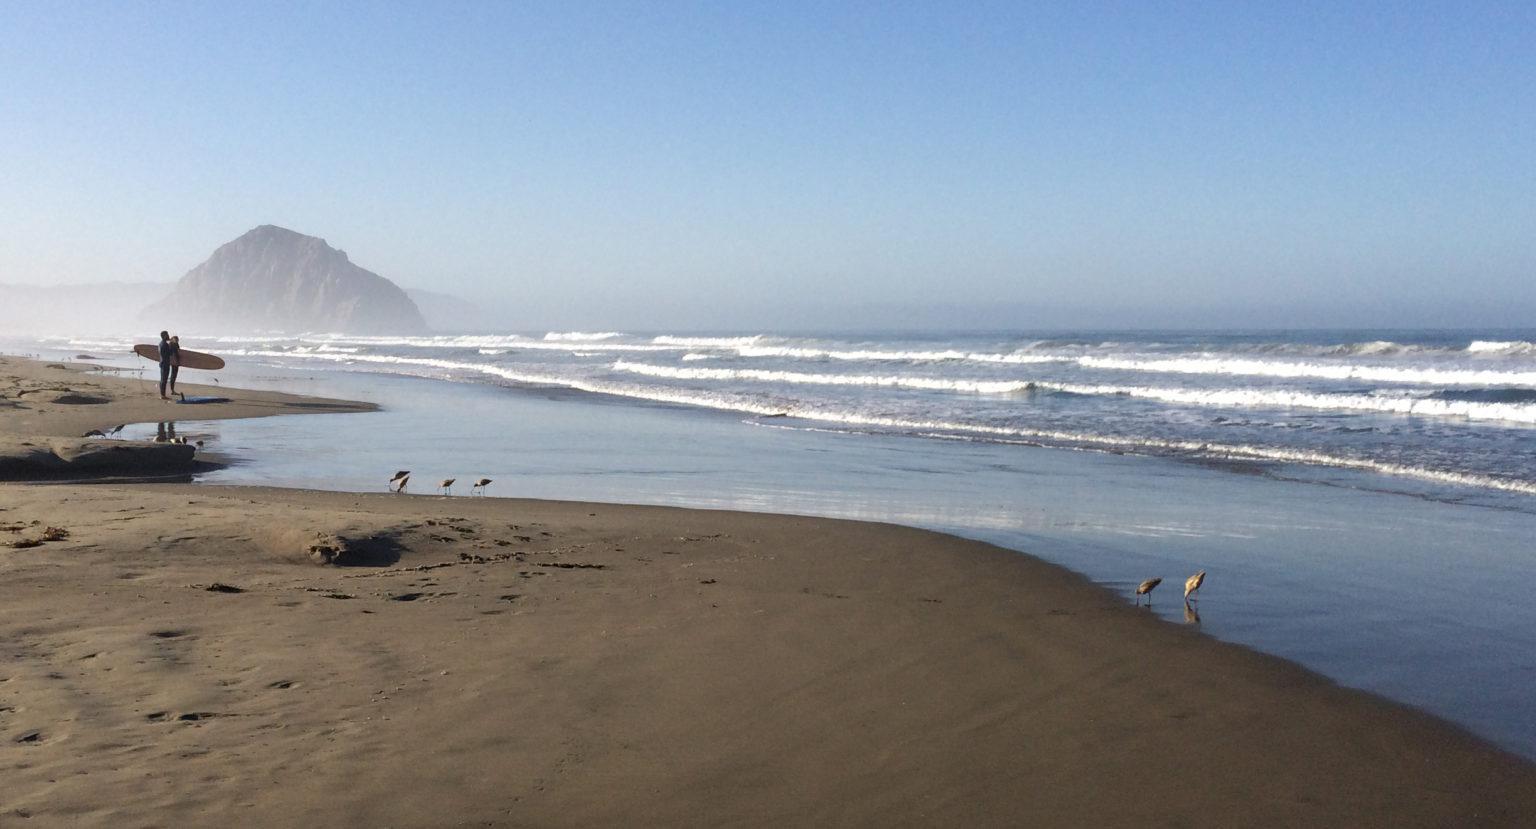 Morro bay beach 1536x829